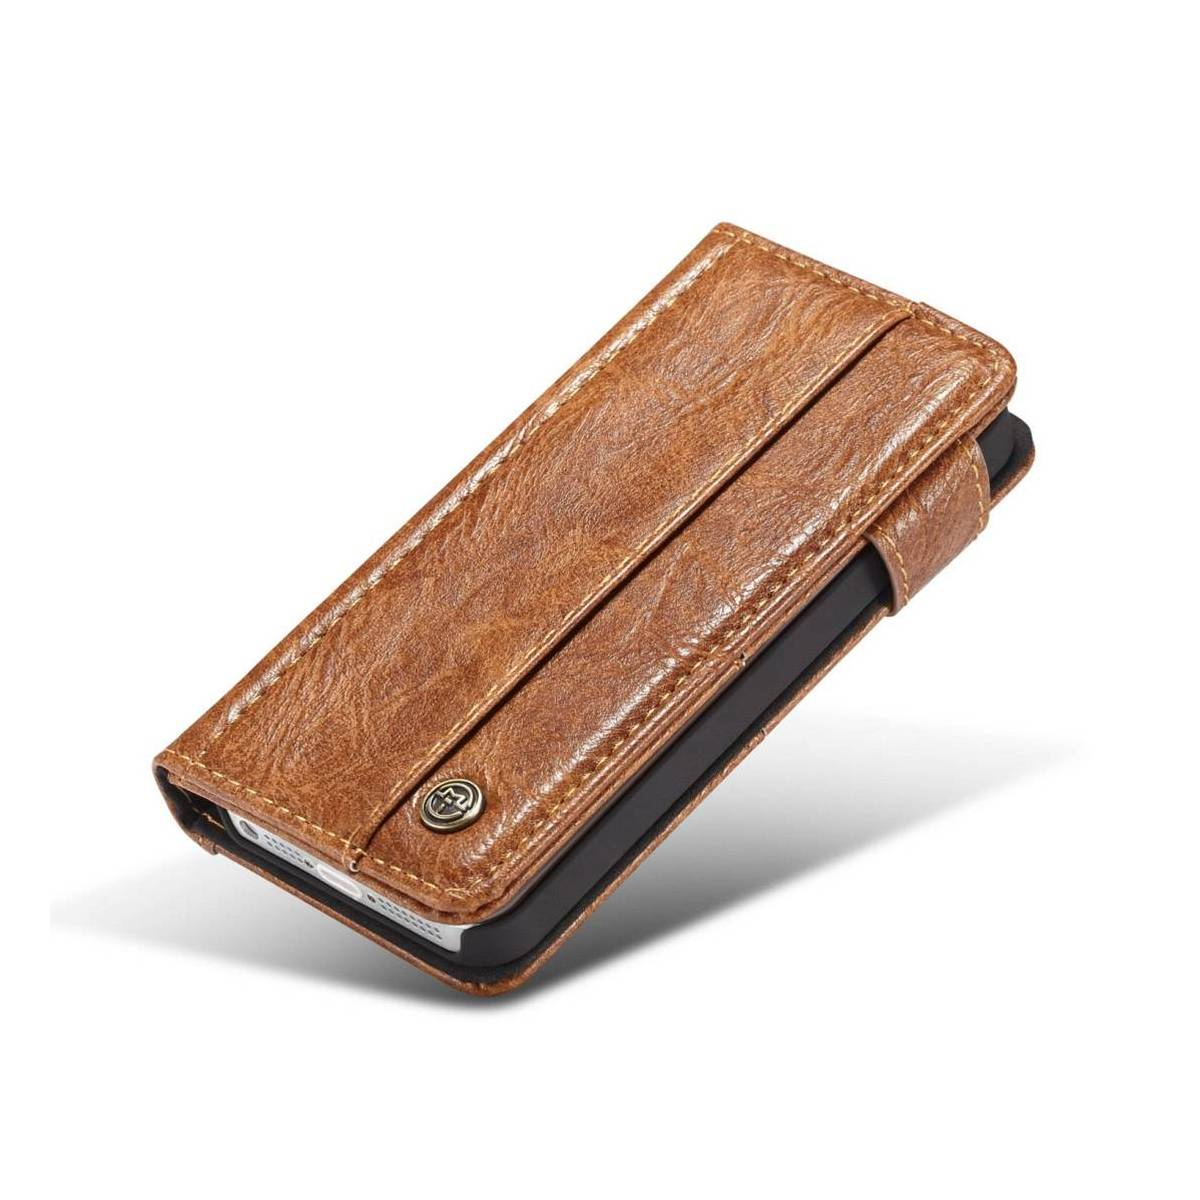 035a6da5a9e Fedt iPhone læder pung-cover sort/brun t. iPhone 5, 5s og se ...